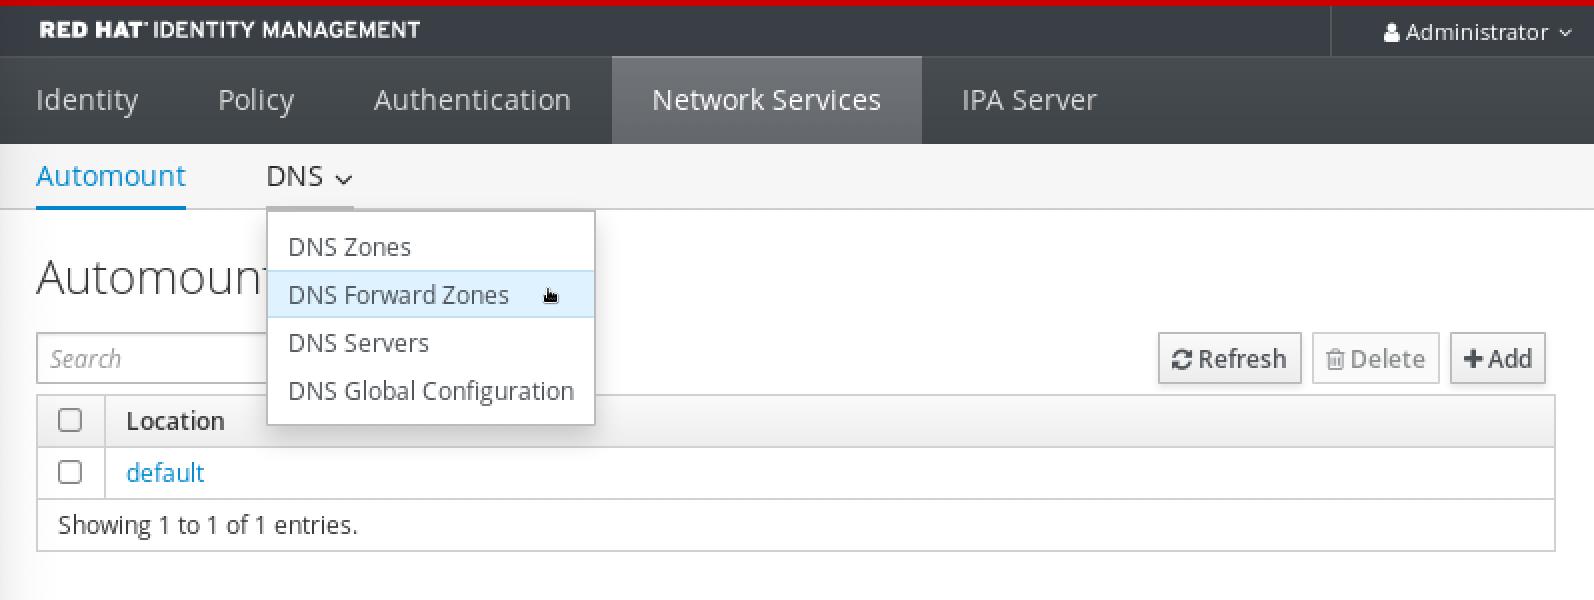 Selecting DNS Forward Zones from the DNS menu